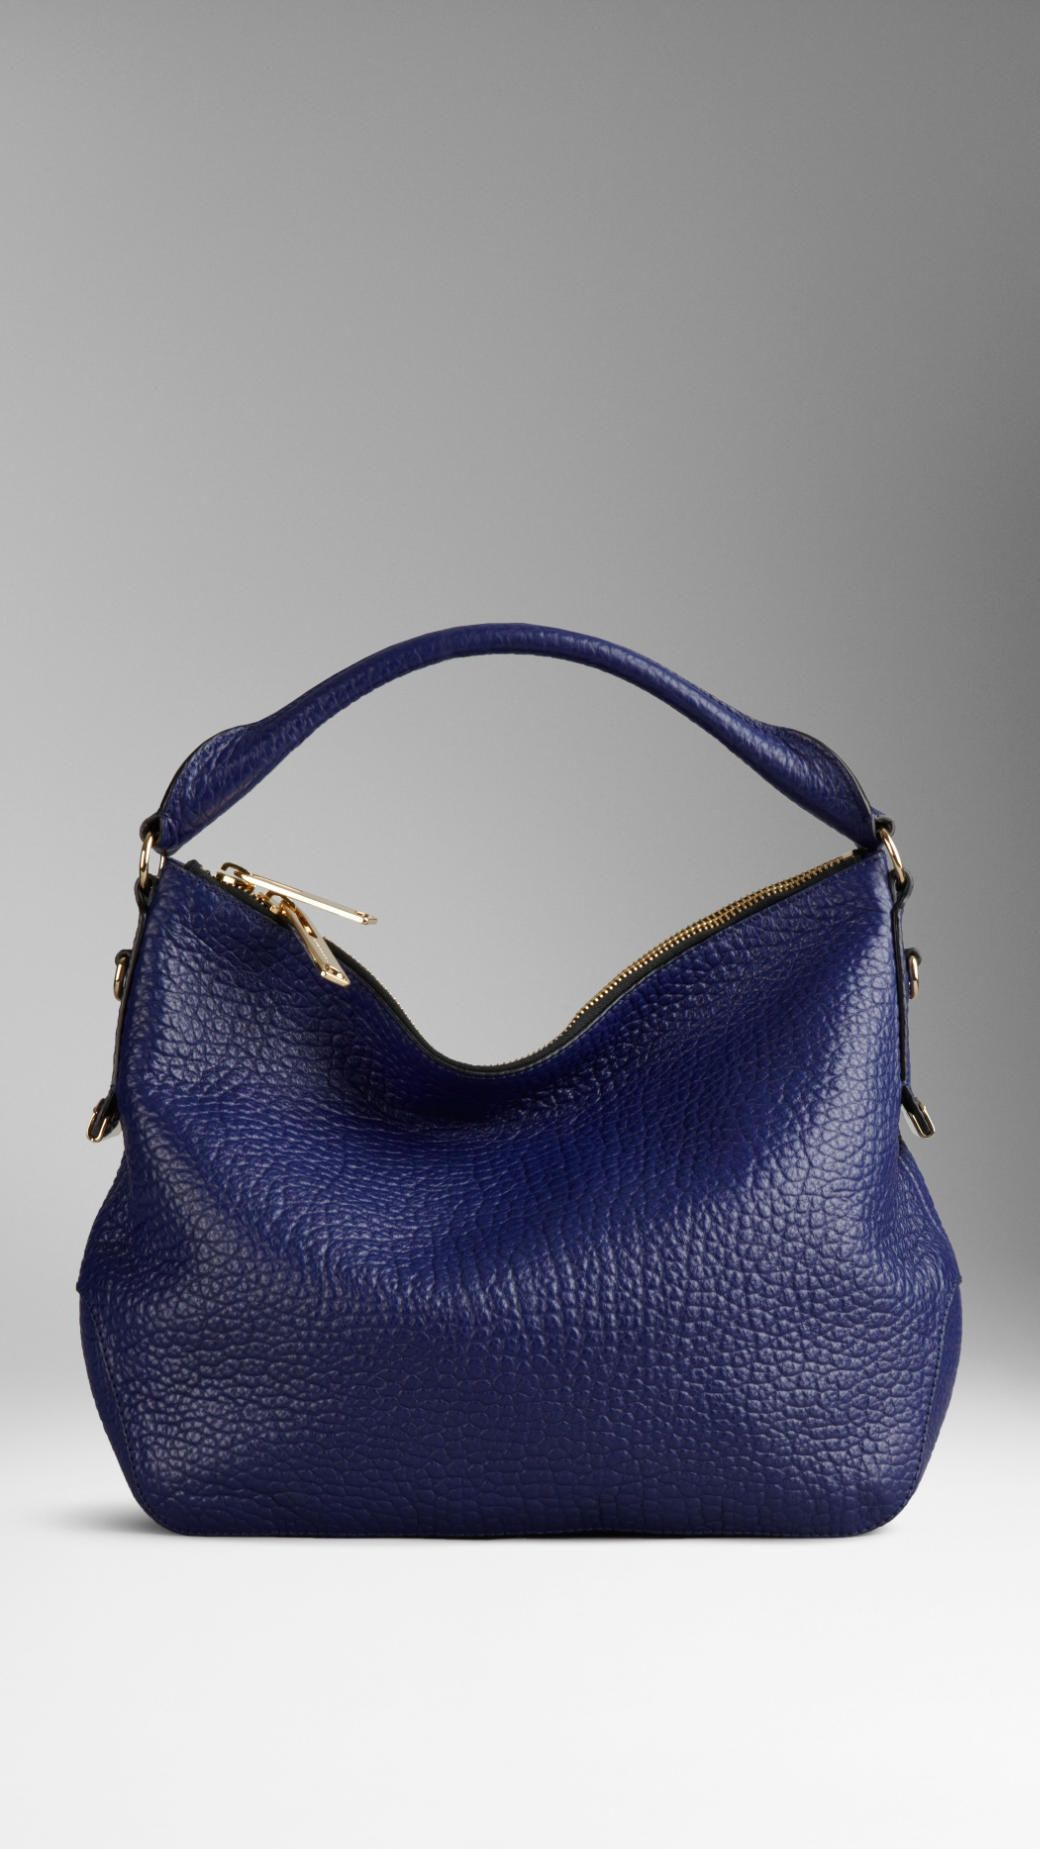 82316a6fdcdd Small Signature Grain Leather Hobo Bag